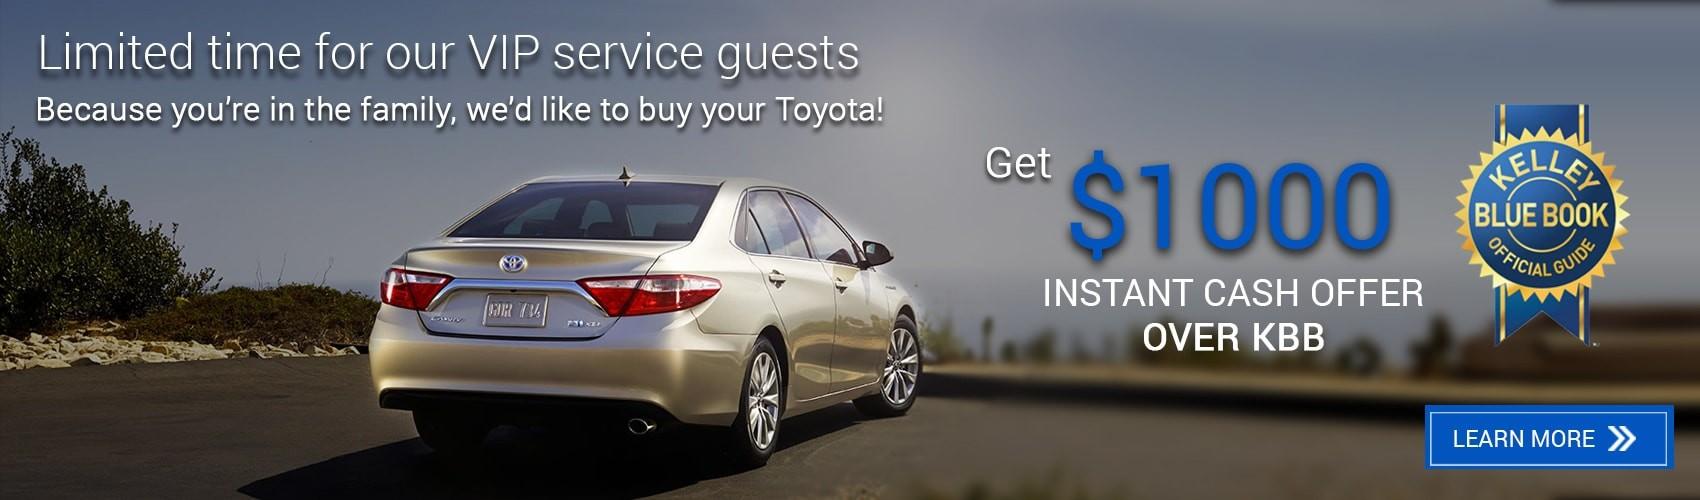 KBB Instant Cash Offer by Beaverton Toyota